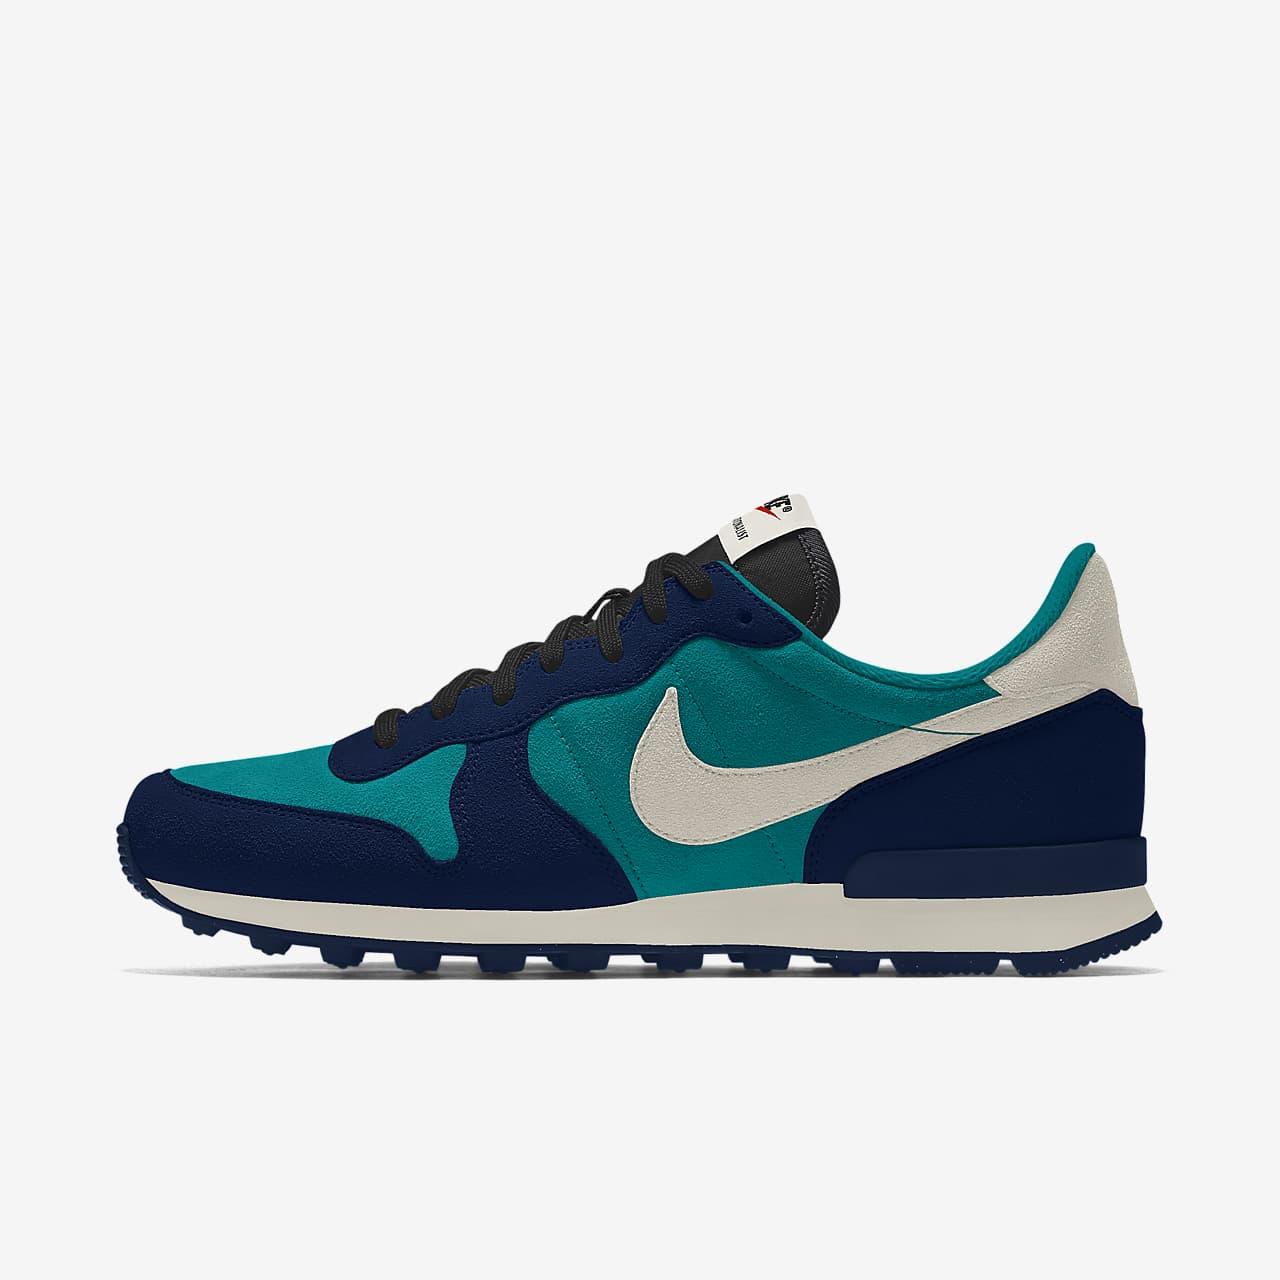 Custom Nike Internationalist By You-sko til kvinder